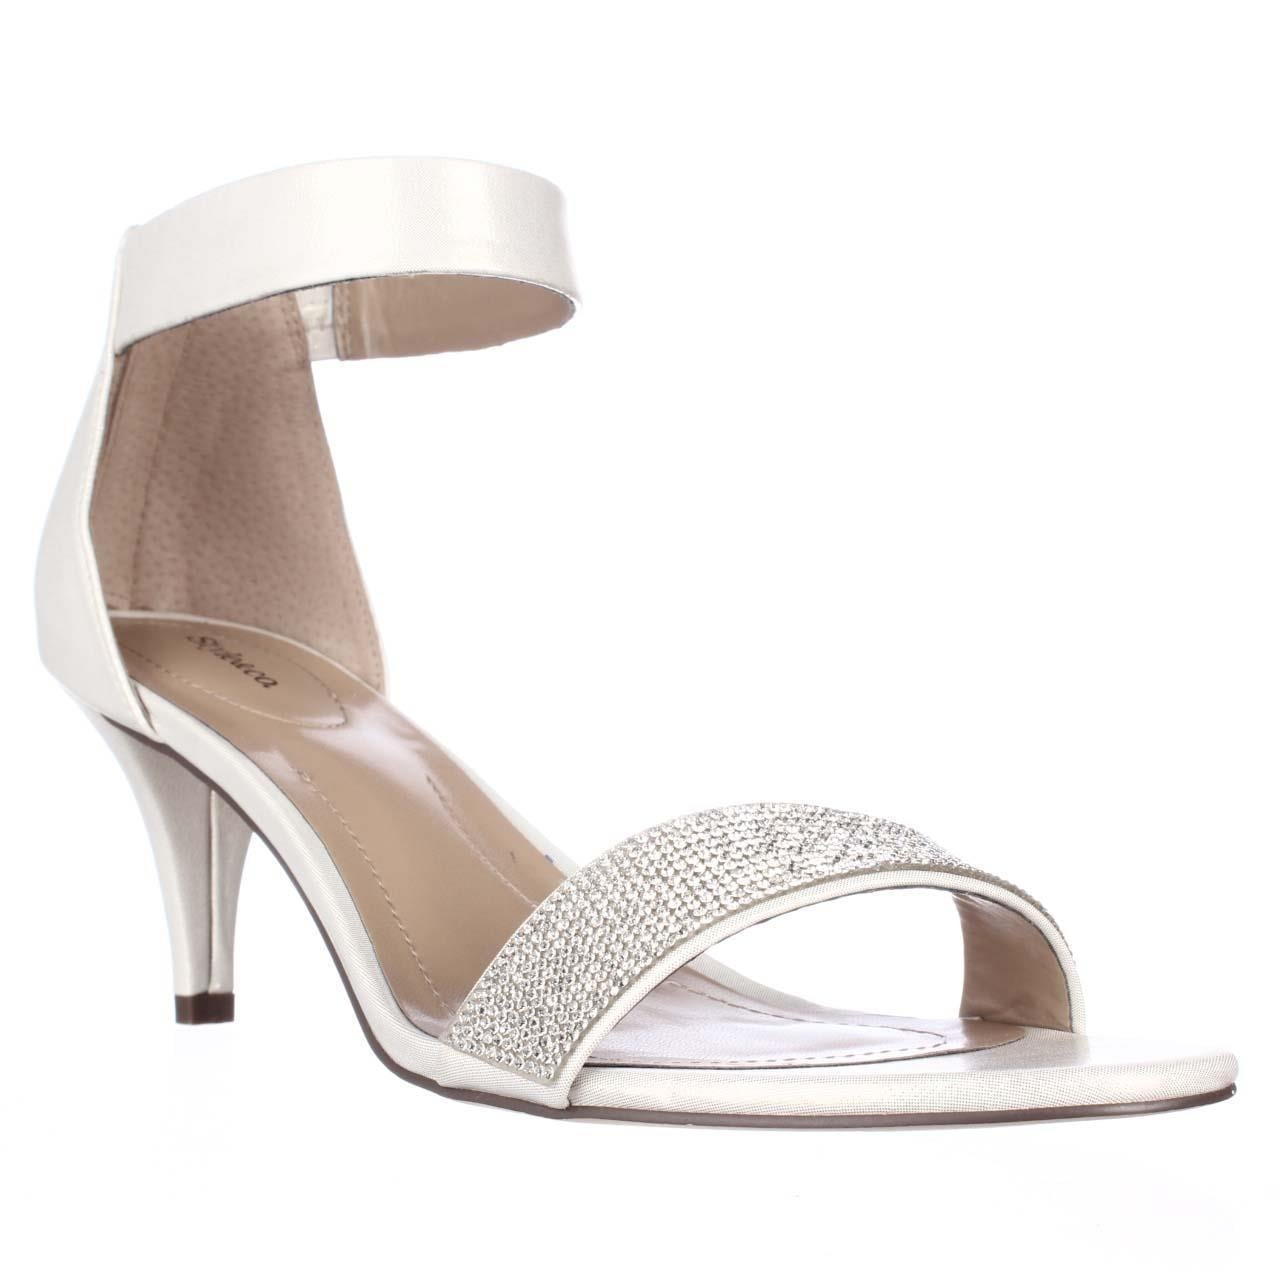 Shop SC35 Phillys Ankle-Strap Evening Sandals